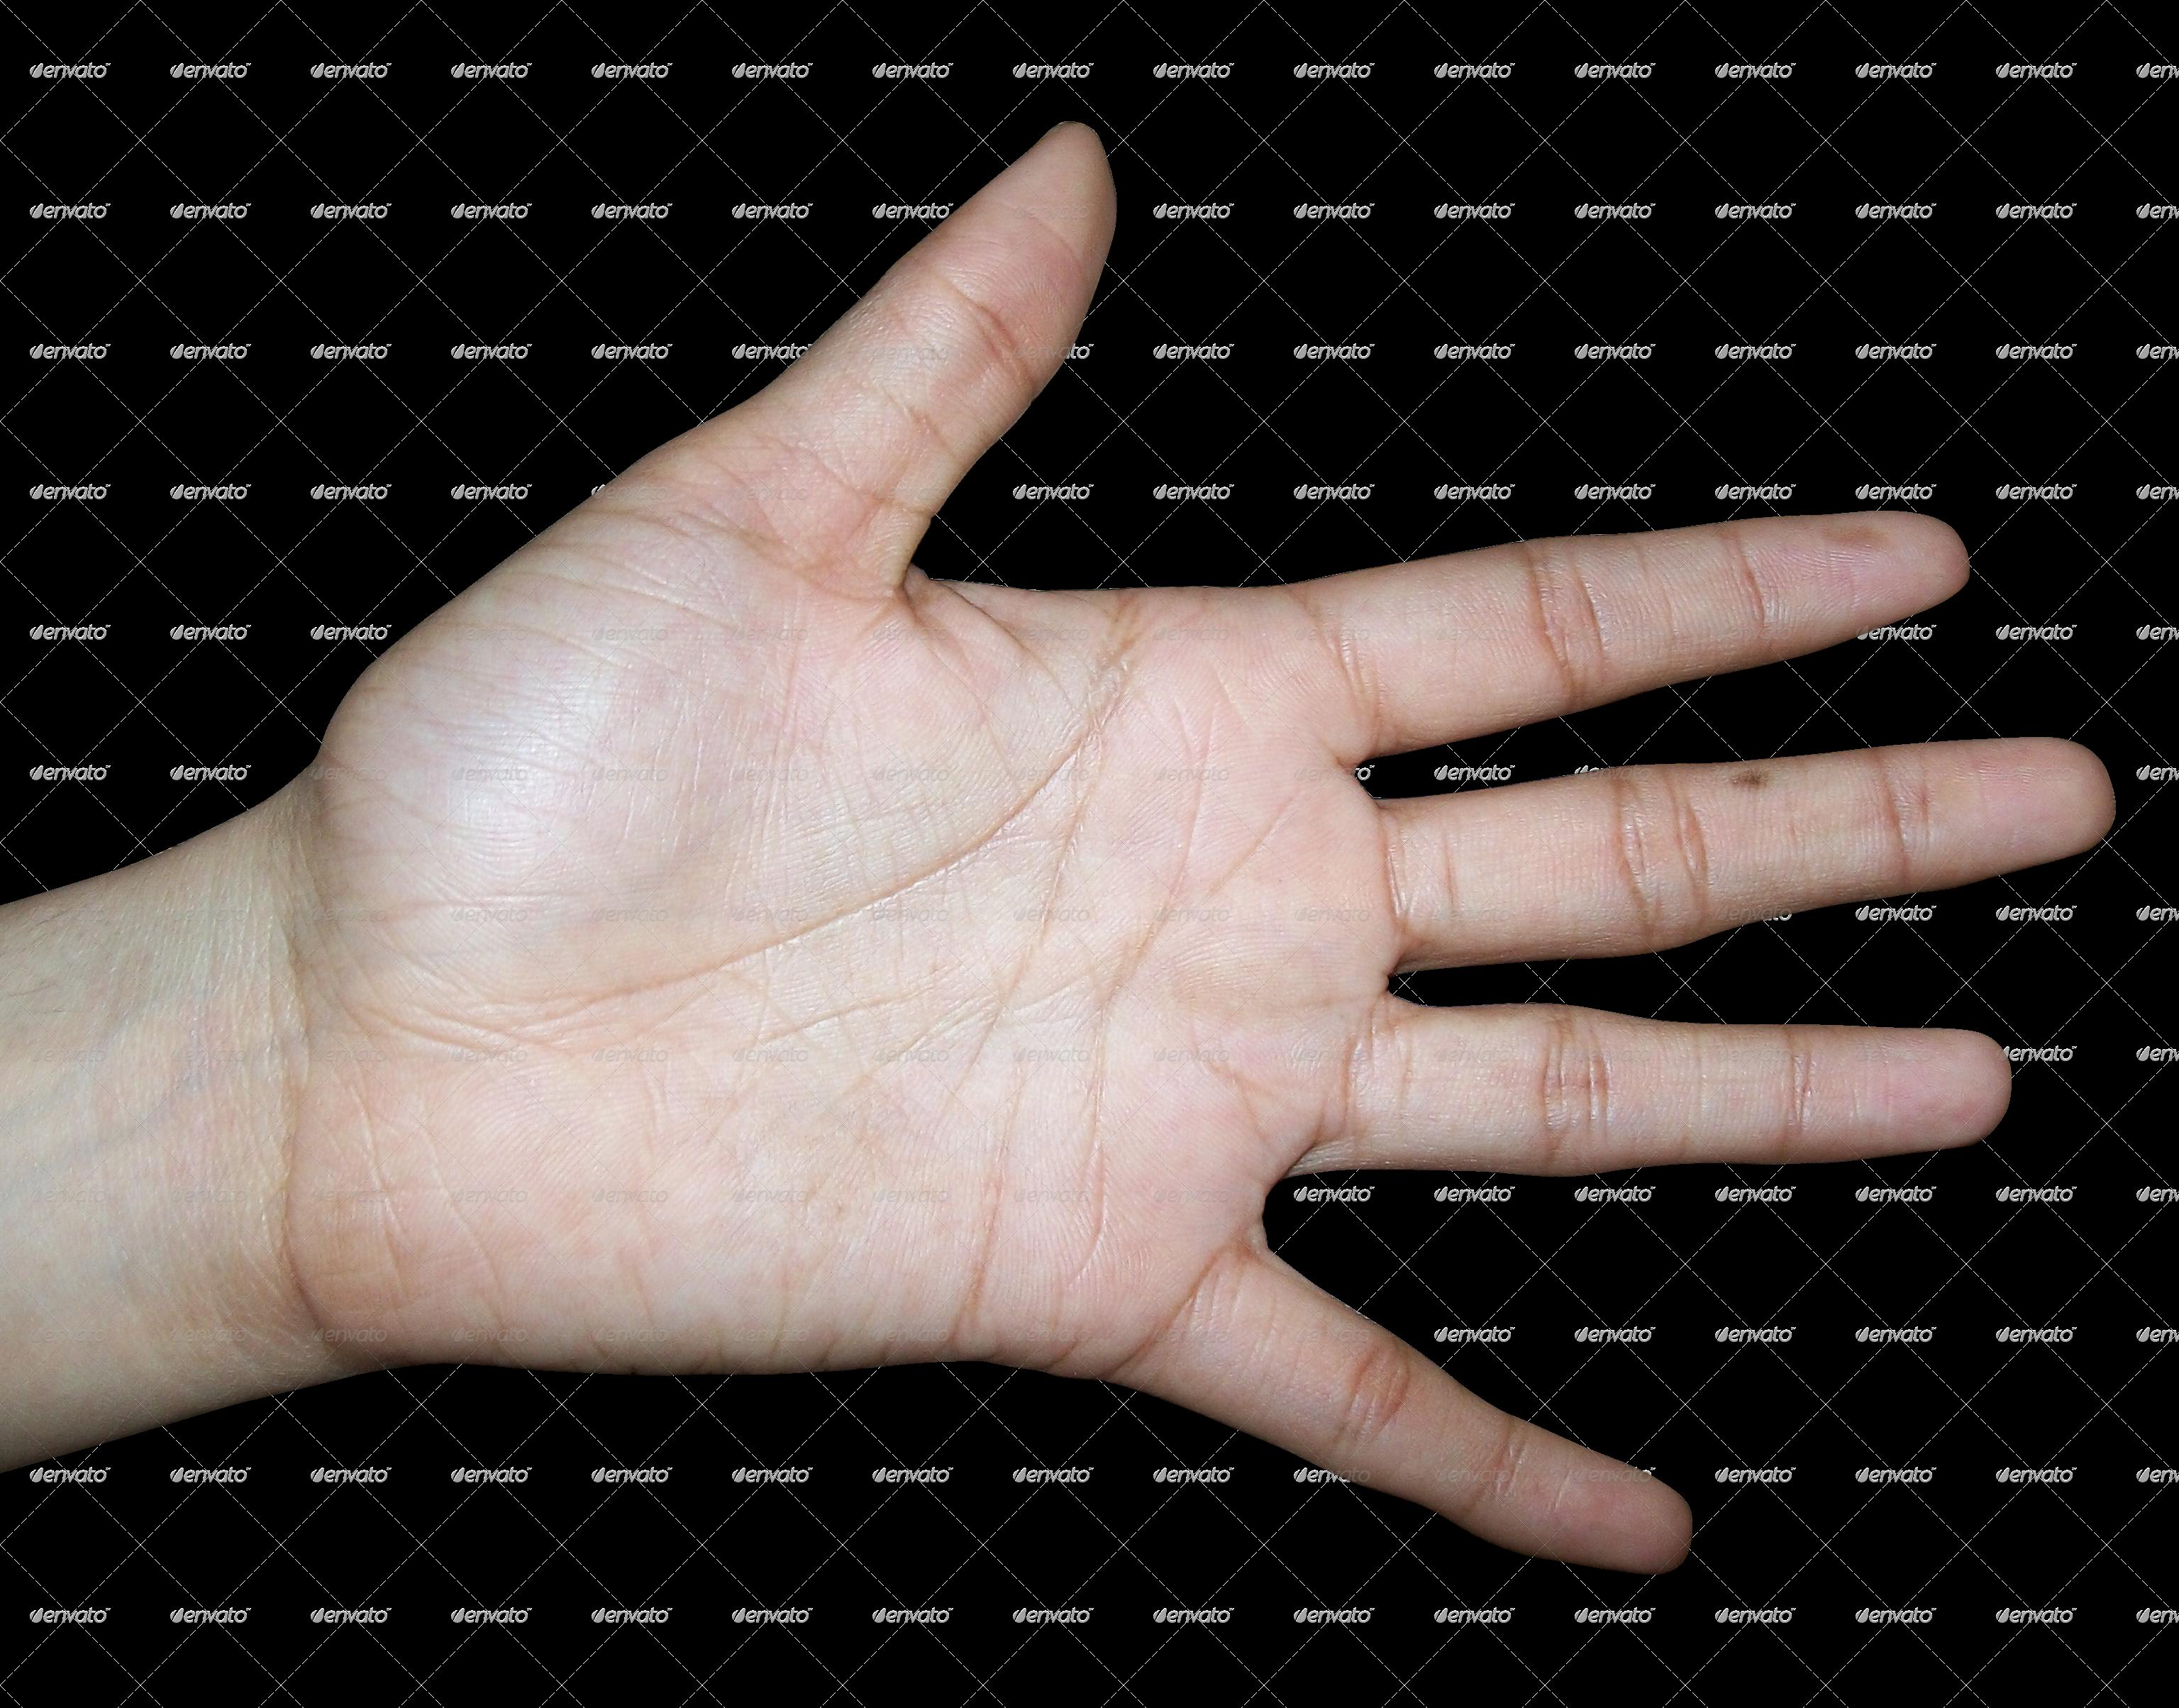 Hands clipart human hand. Textures by chandank docean